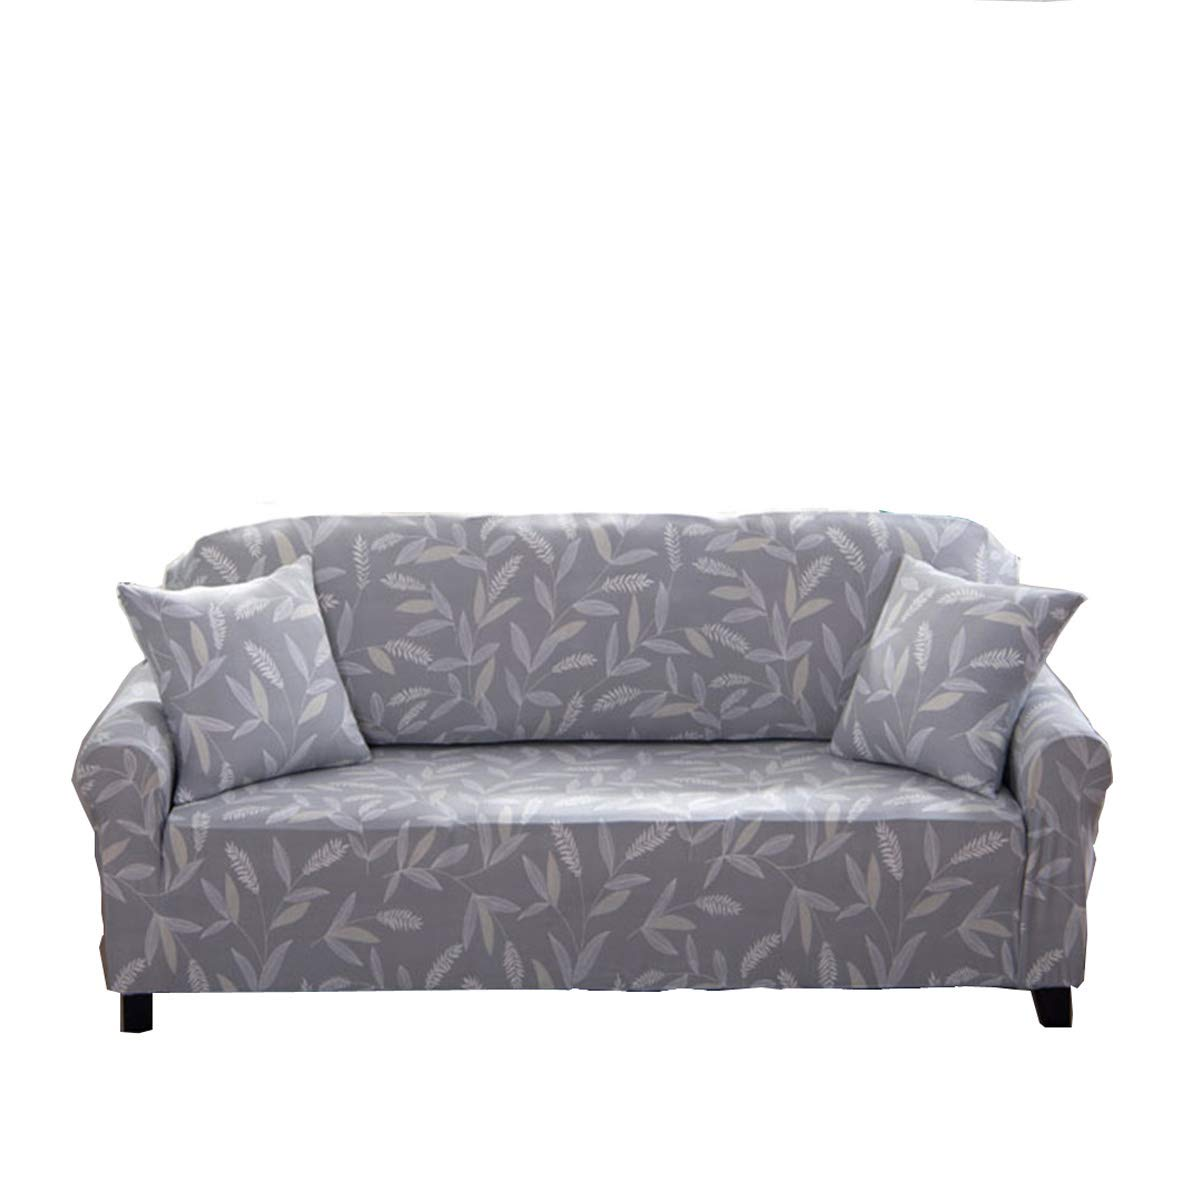 ENZER Funda de sofá Tejido Elástico Flor Pájaro Sofá Proteger Cubre sofá 1 2 3 Plazas (Bambú, 1 Plaza)